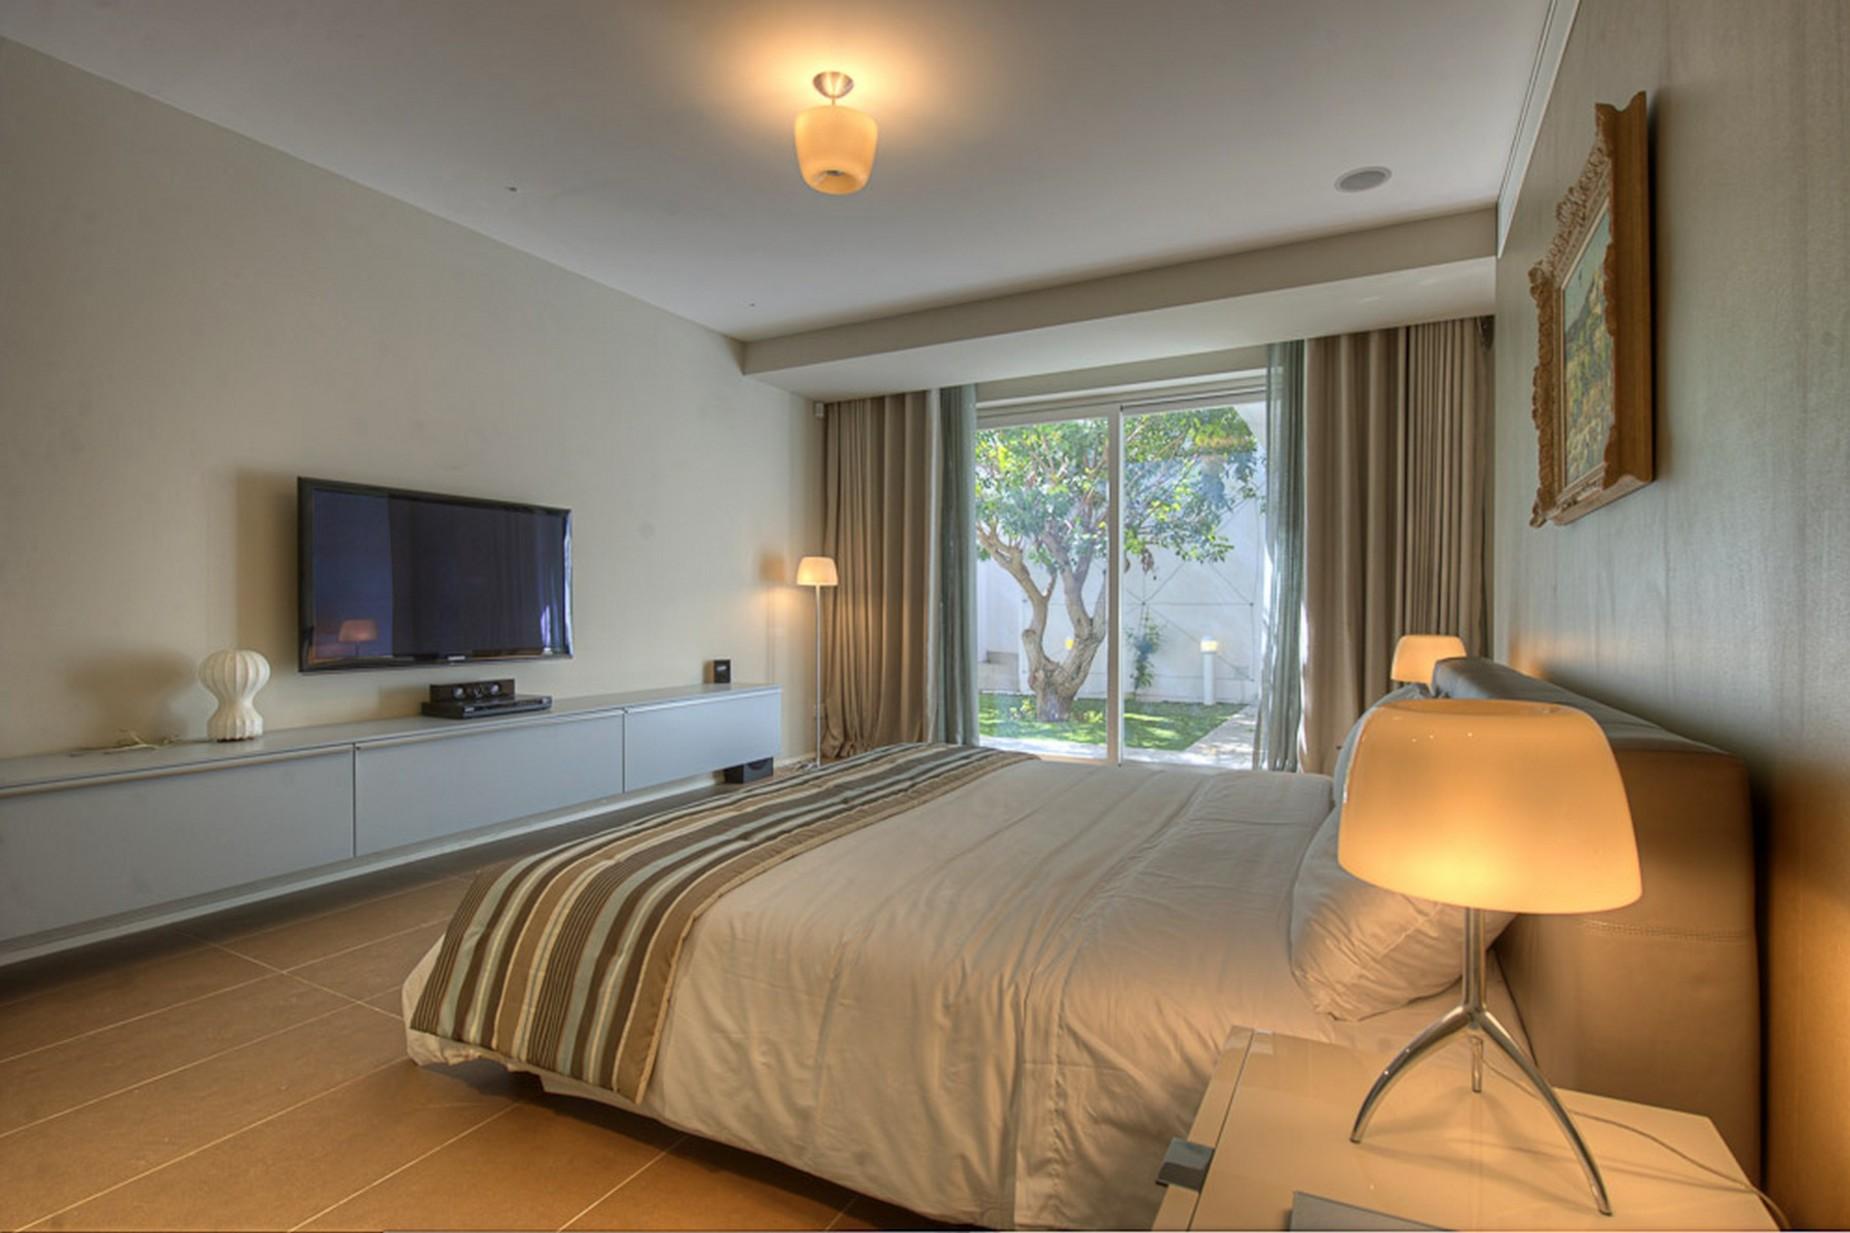 3 bed Villa For Rent in Bahar ic-Caghaq, Bahar ic-Caghaq - thumb 13